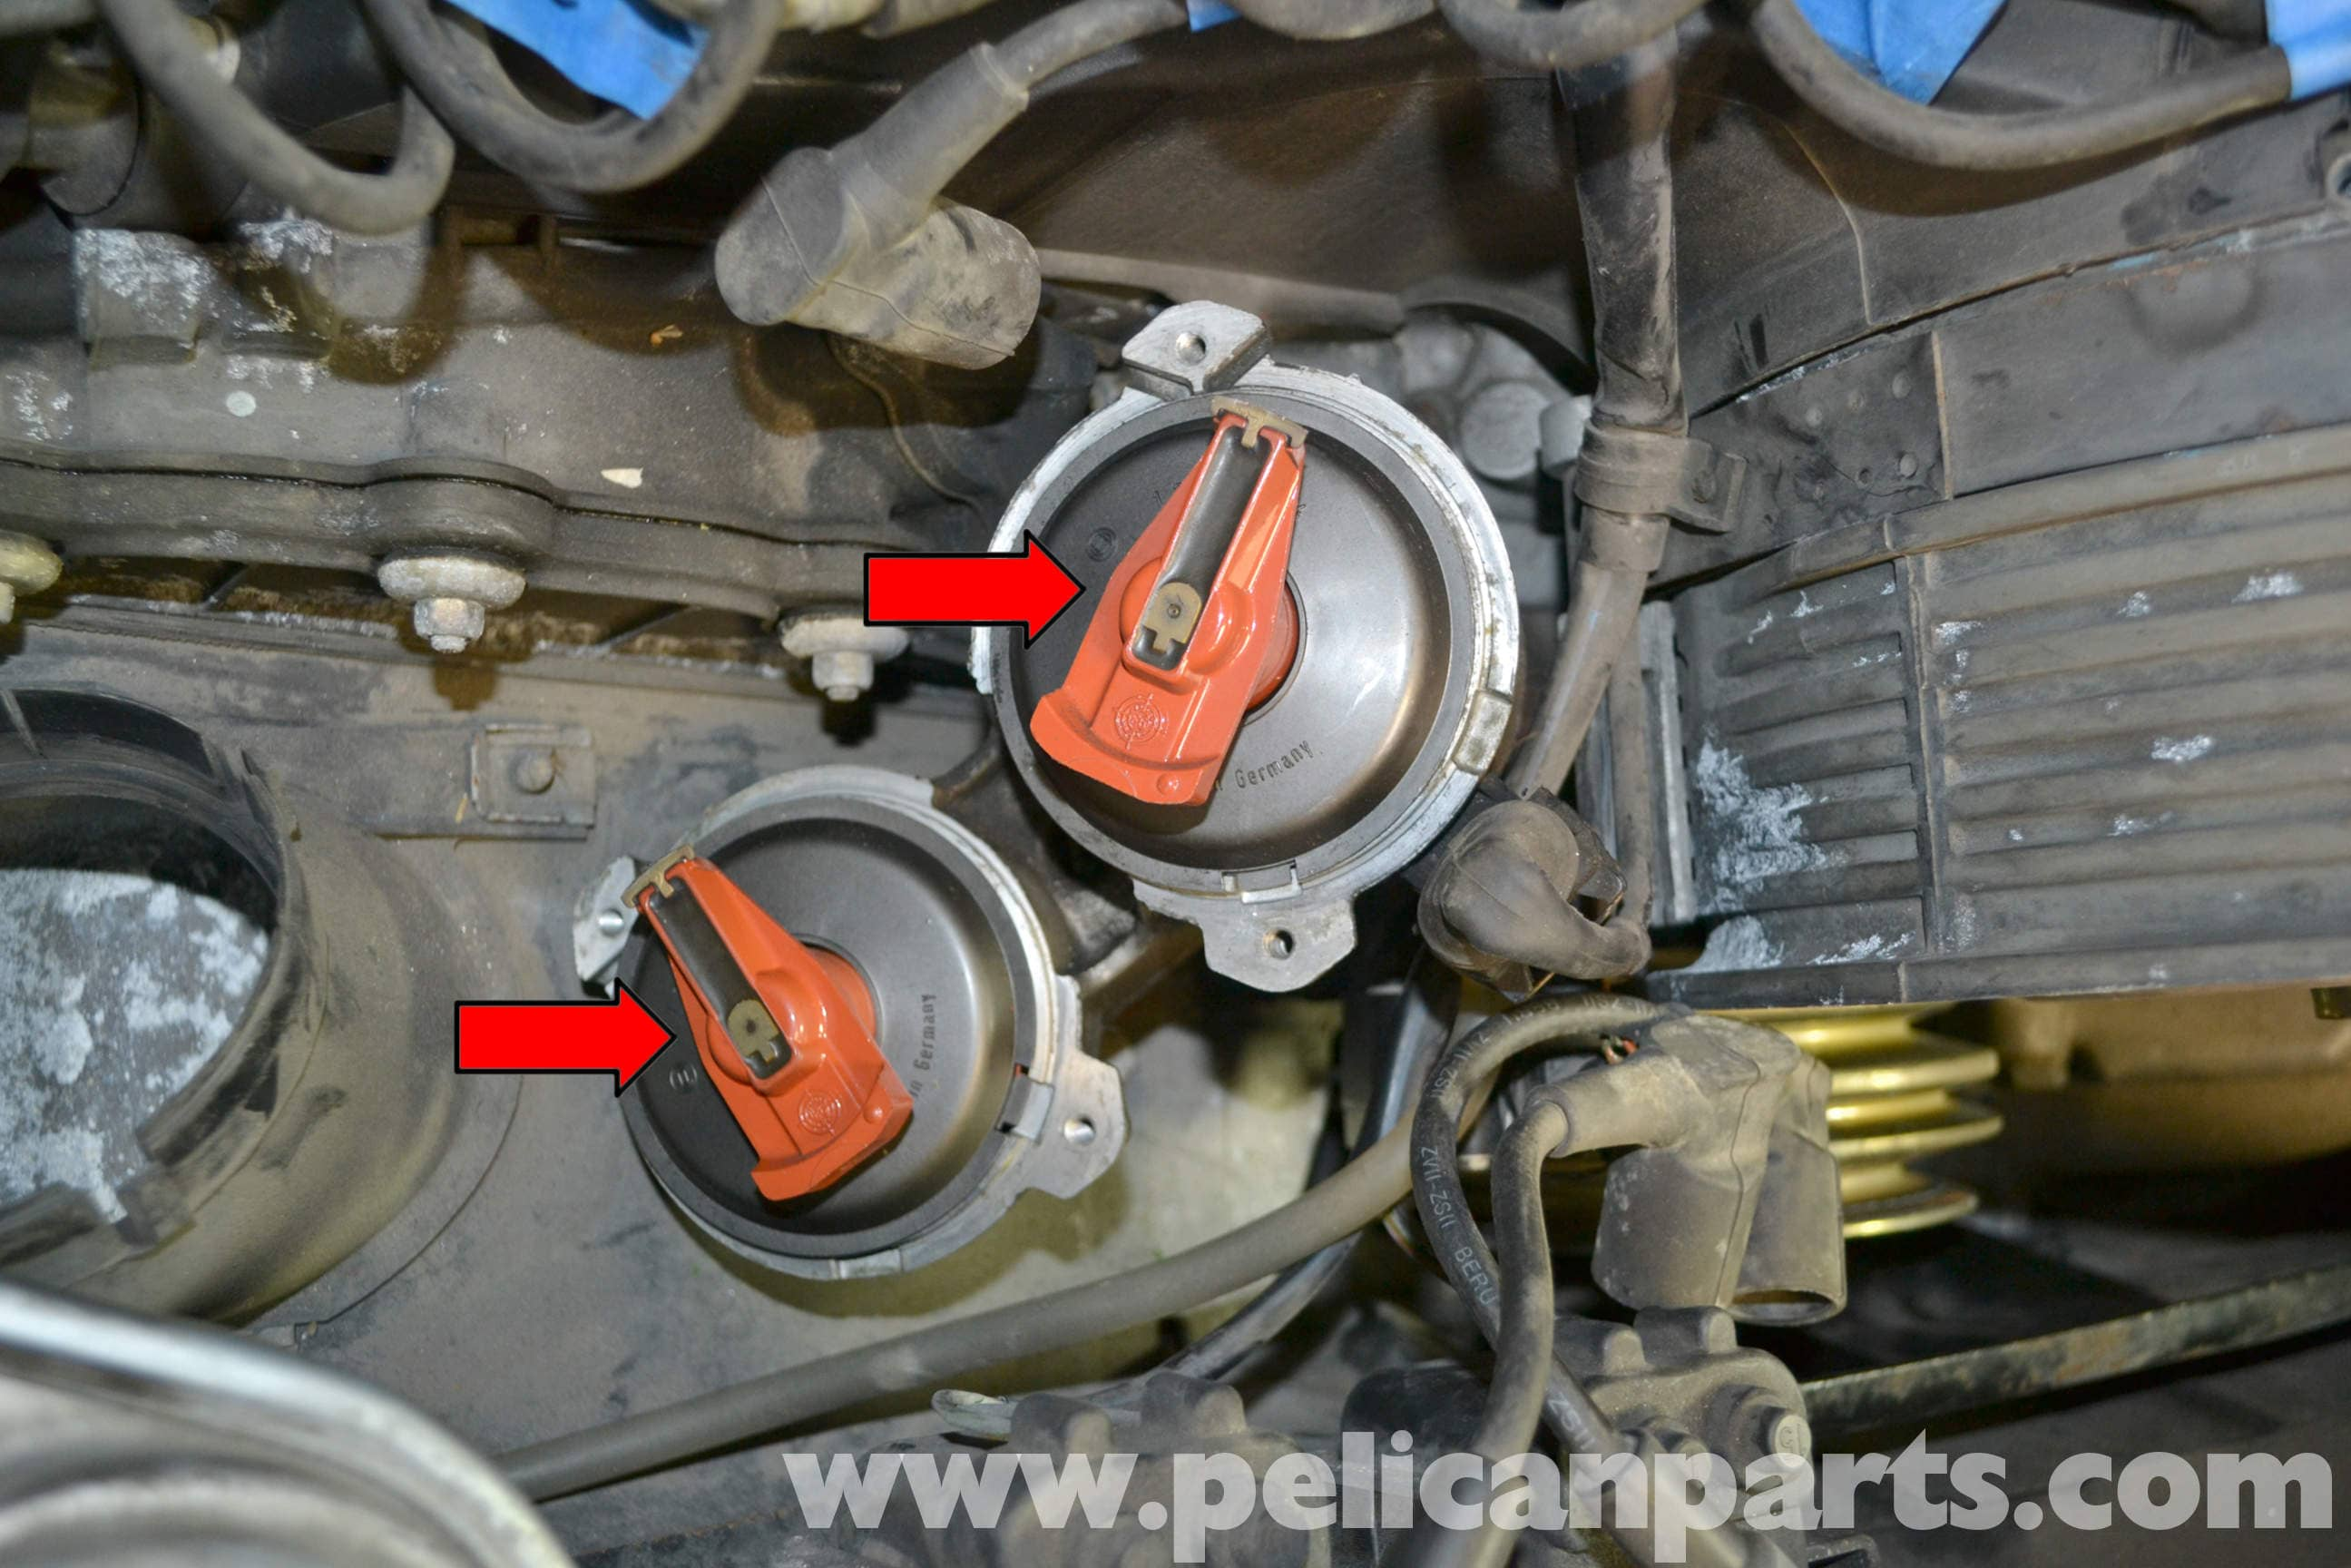 Pelican Technical Article - Porsche 993 - Distributor Cap and Rotor ...